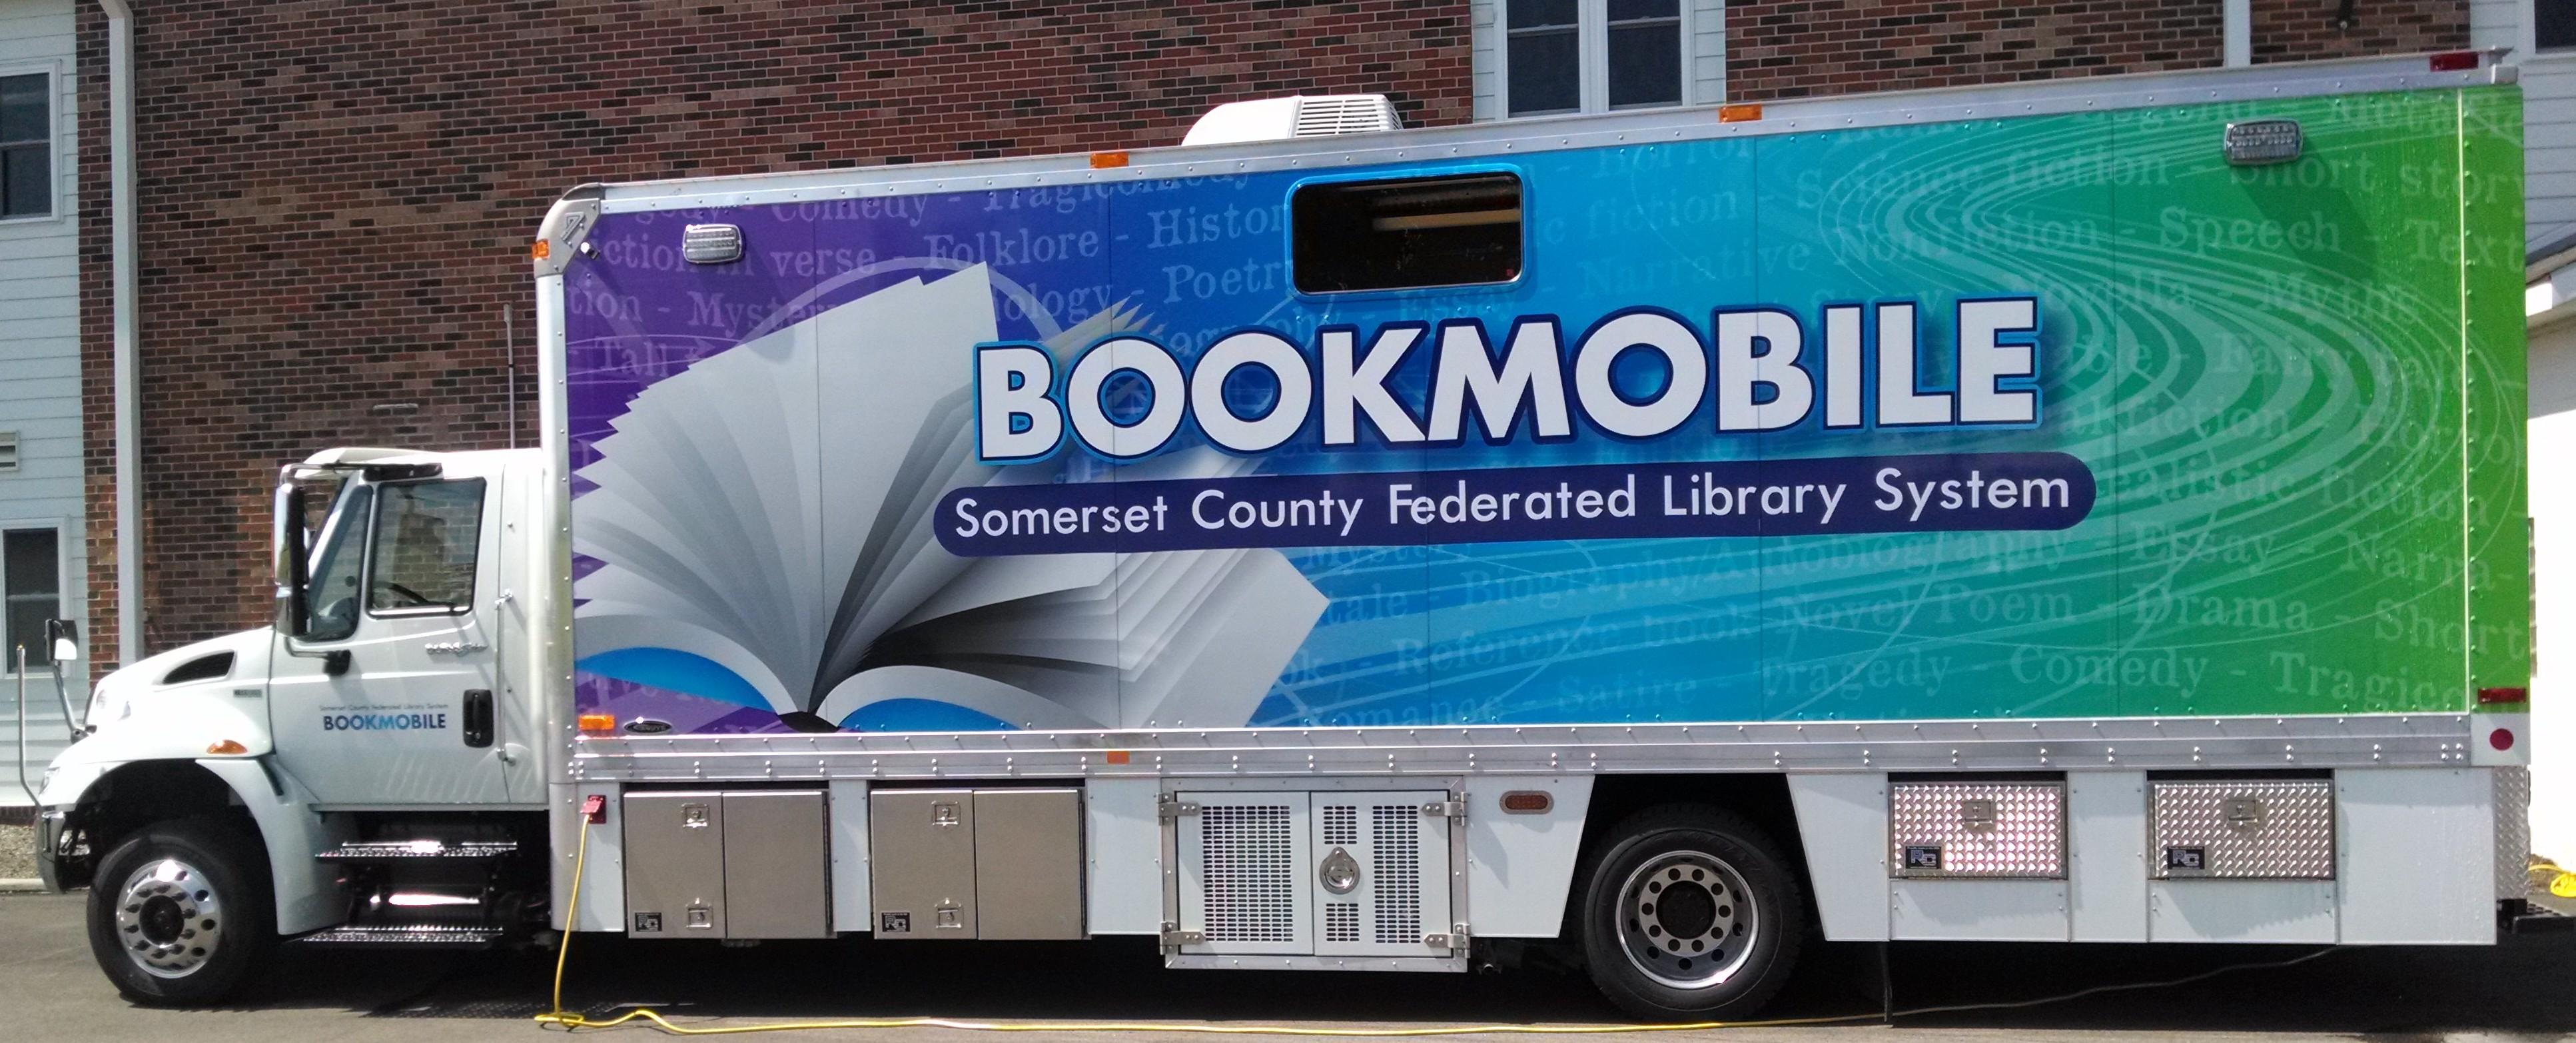 SCFLS Bookmobile photo